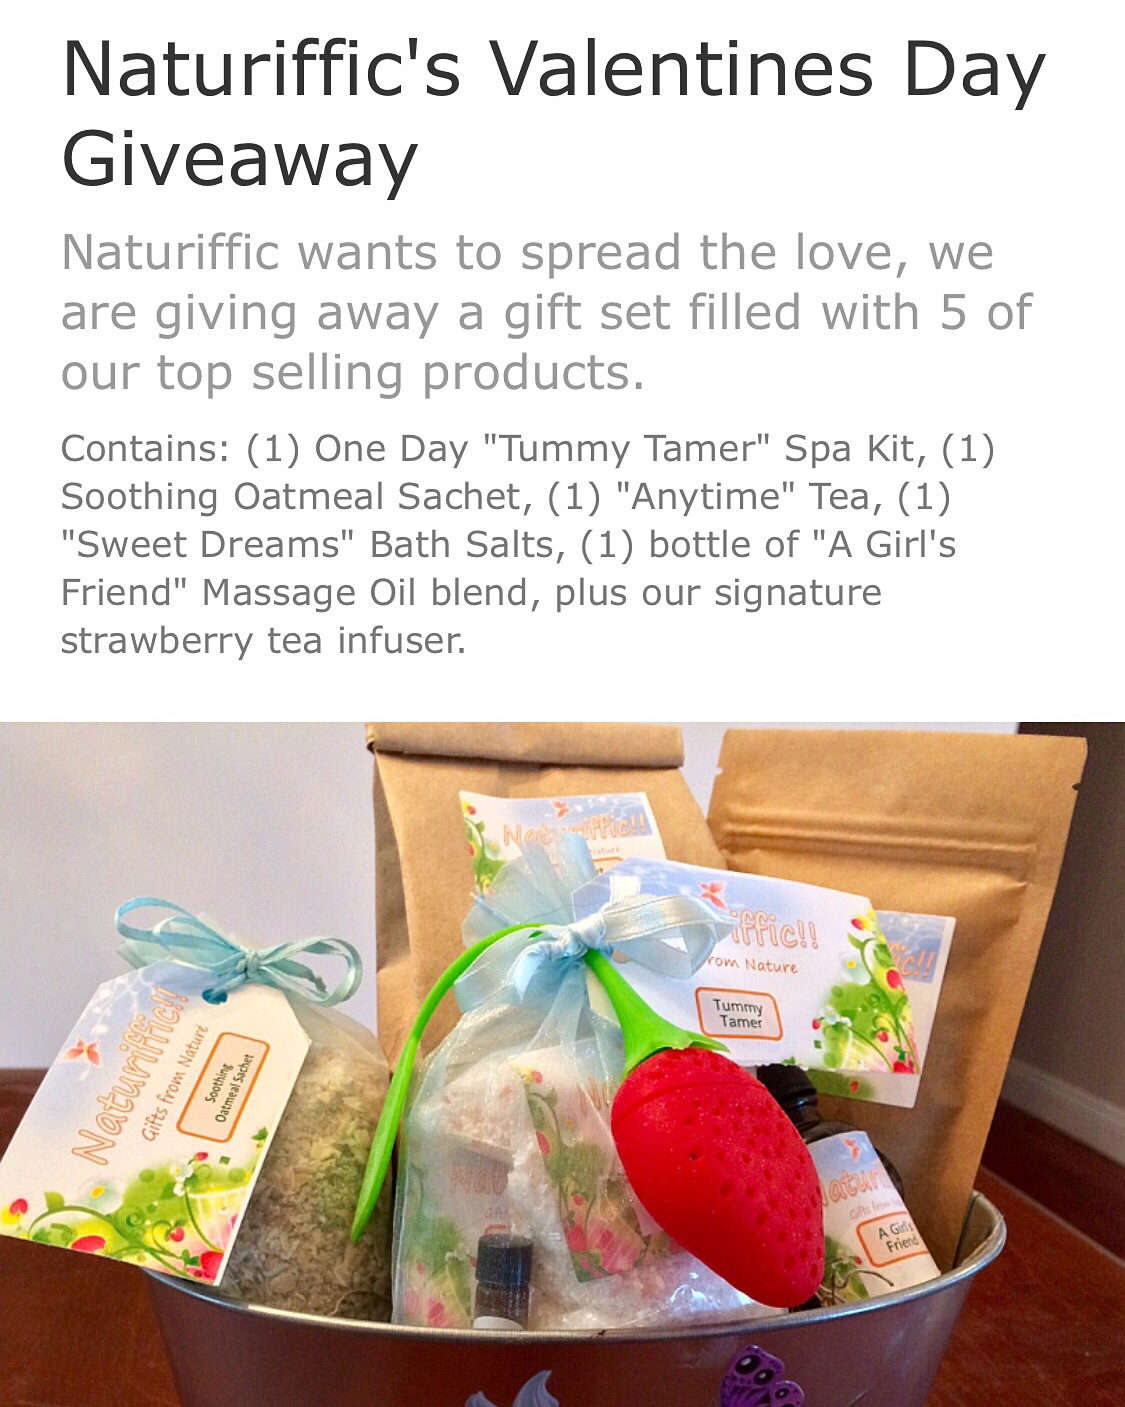 Loose leaf teas, spa kit, bath salts, oatmeal soothing sachet, & massage oils make up this prize!!!!!